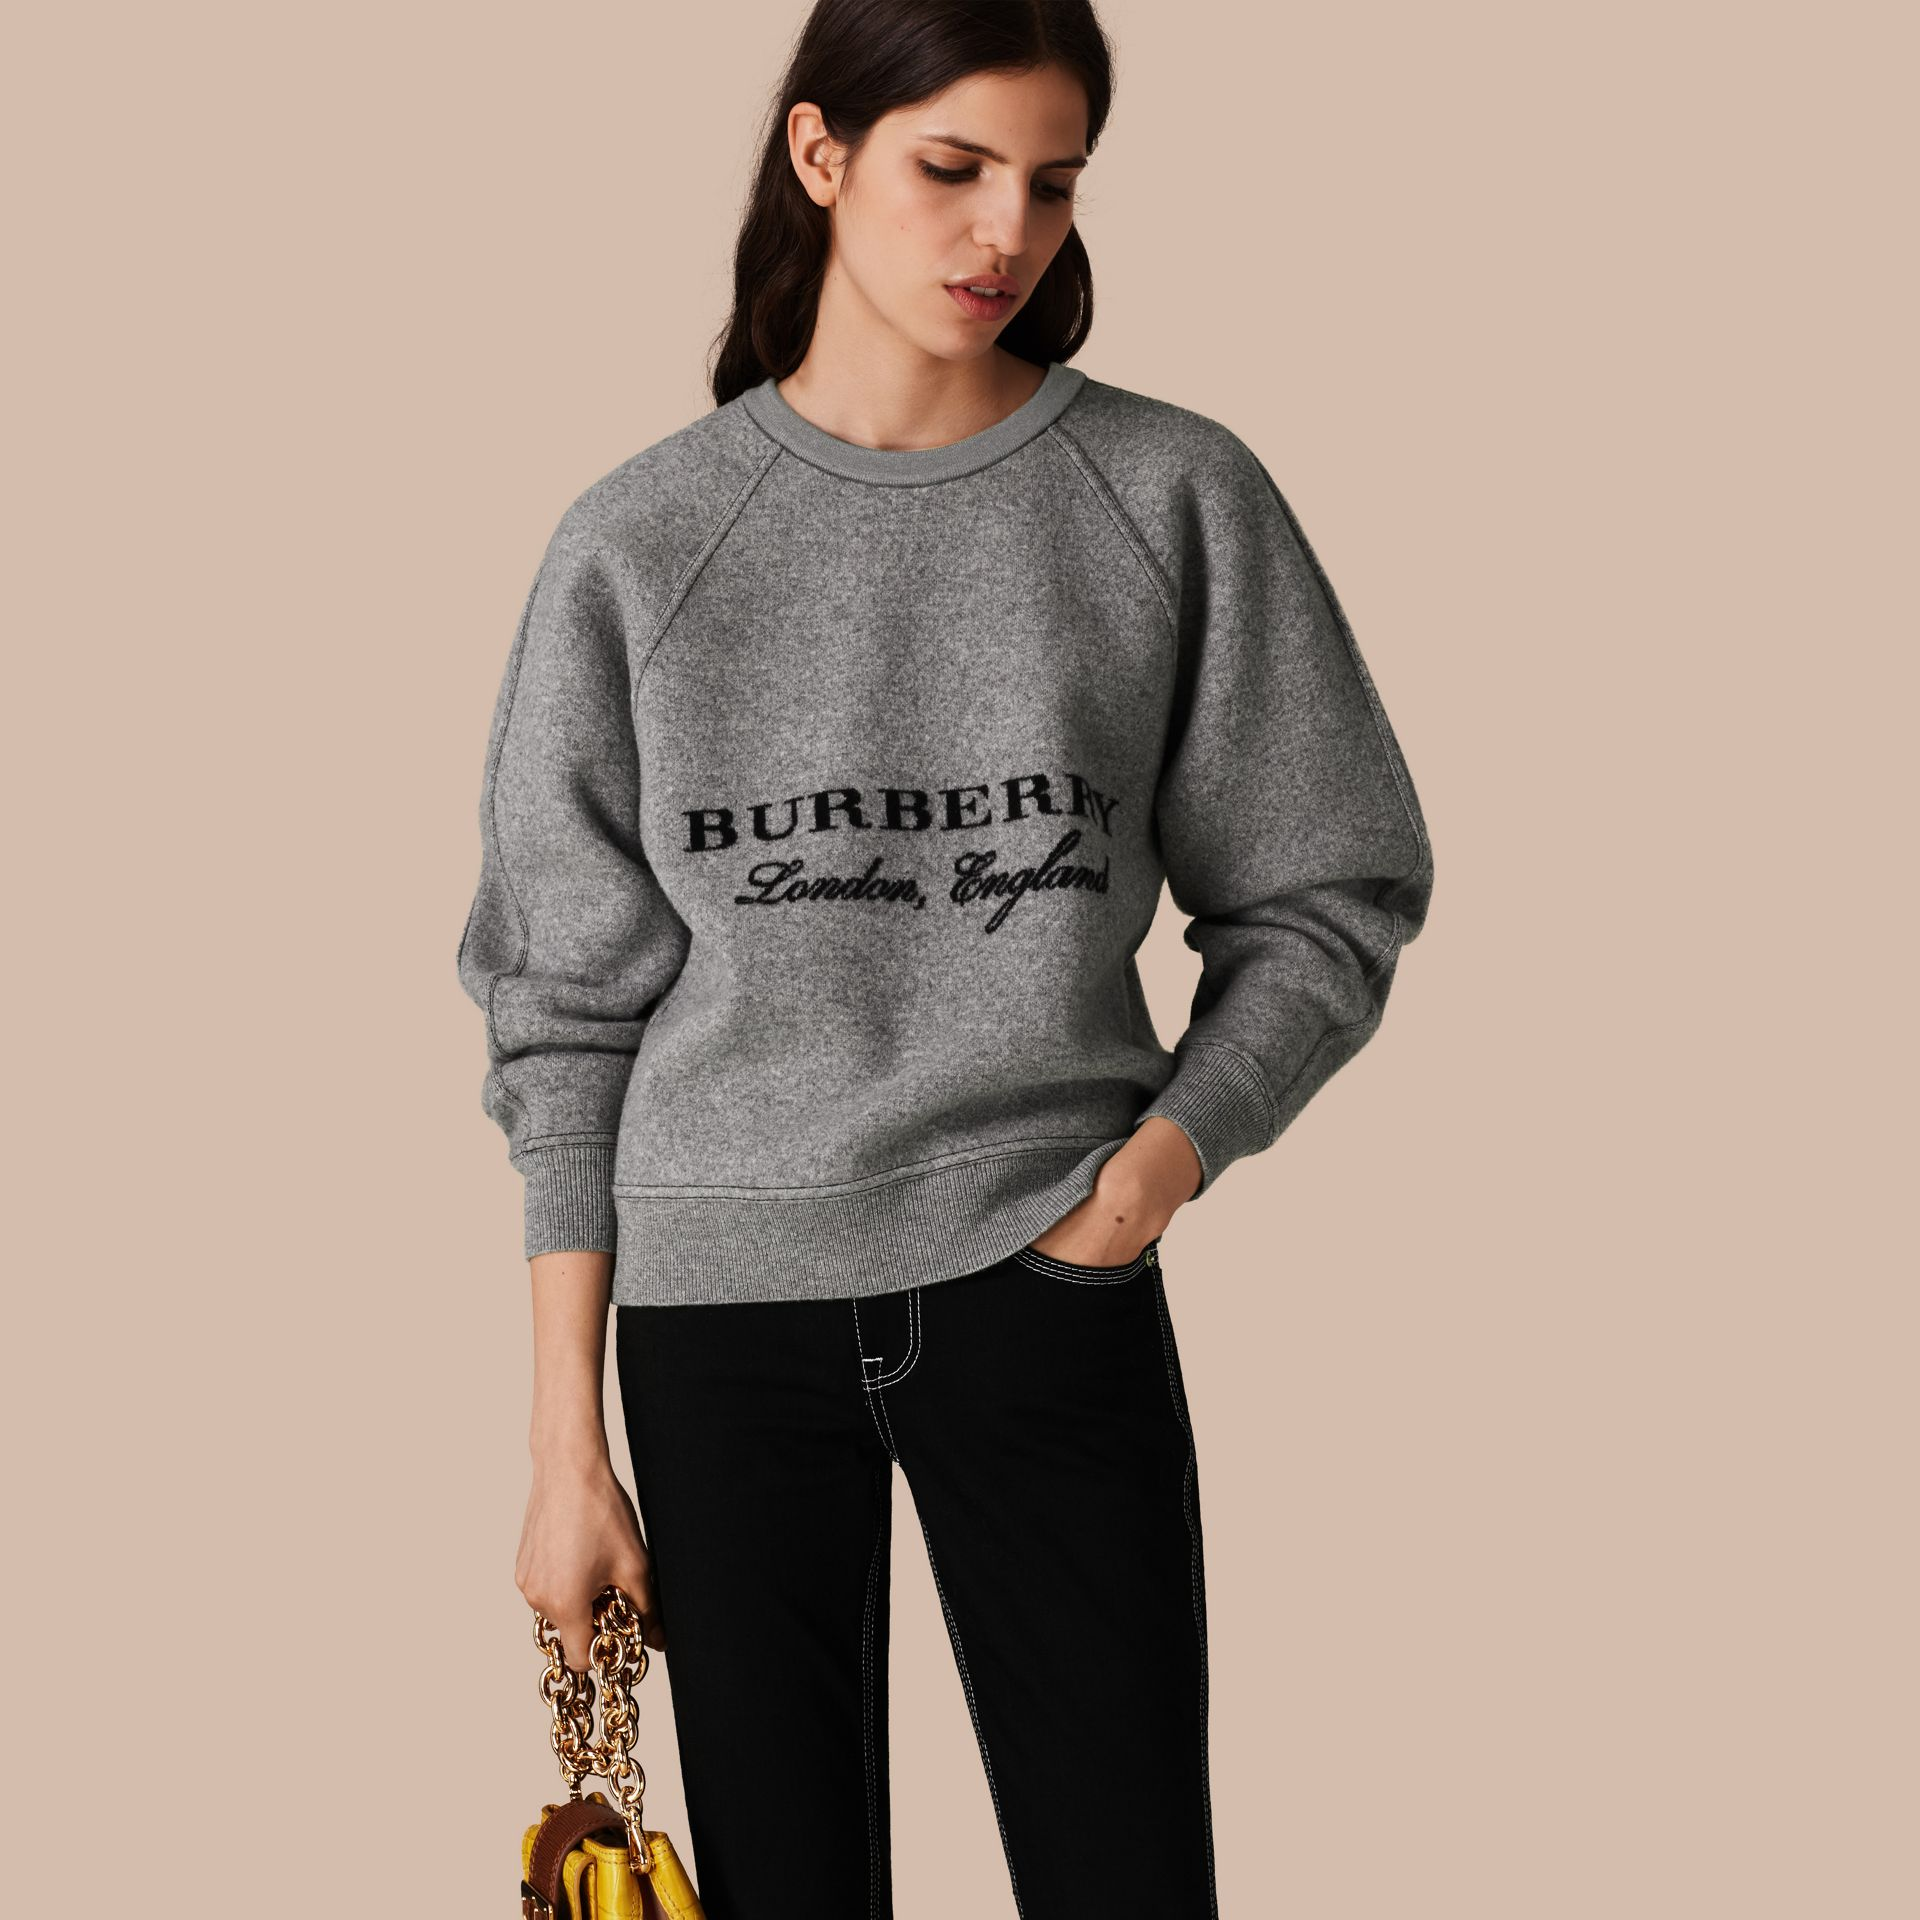 Grigio medio mélange/nero Pullover strutturato in lana e cashmere Grigio Medio Mélange/nero - immagine della galleria 1